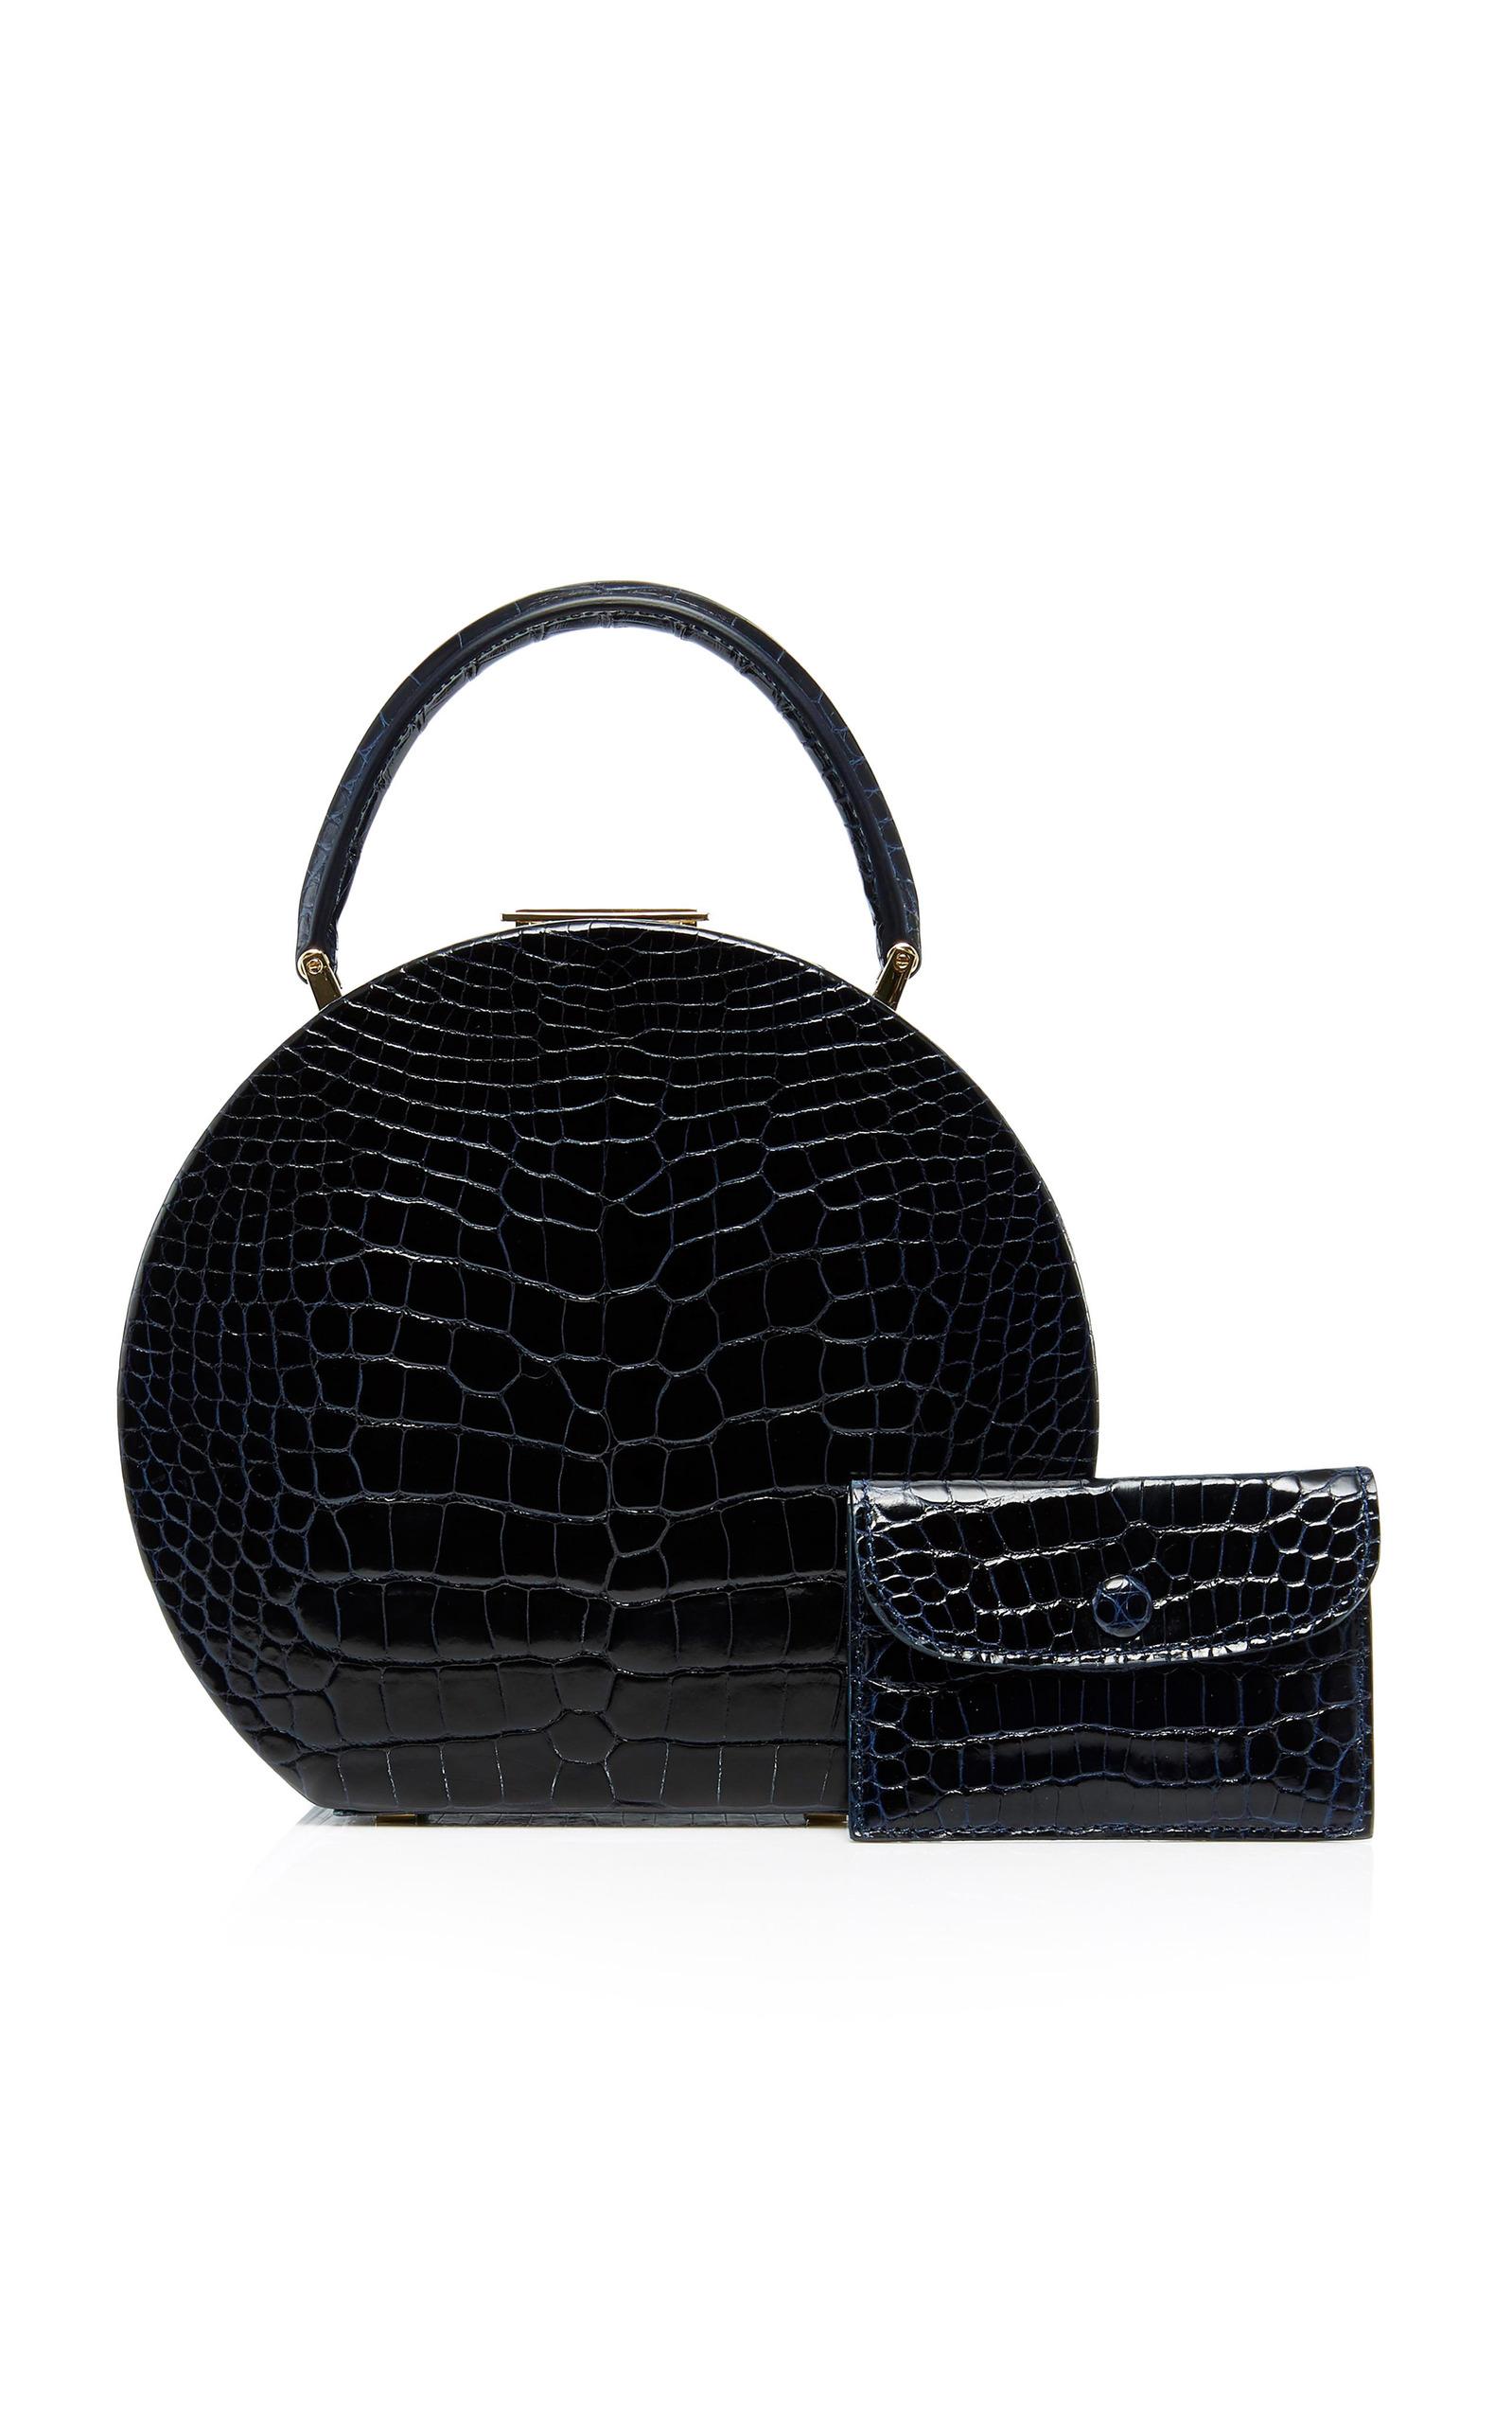 BU Wood 14cm Black Leather Bumi Bag giSrP8O